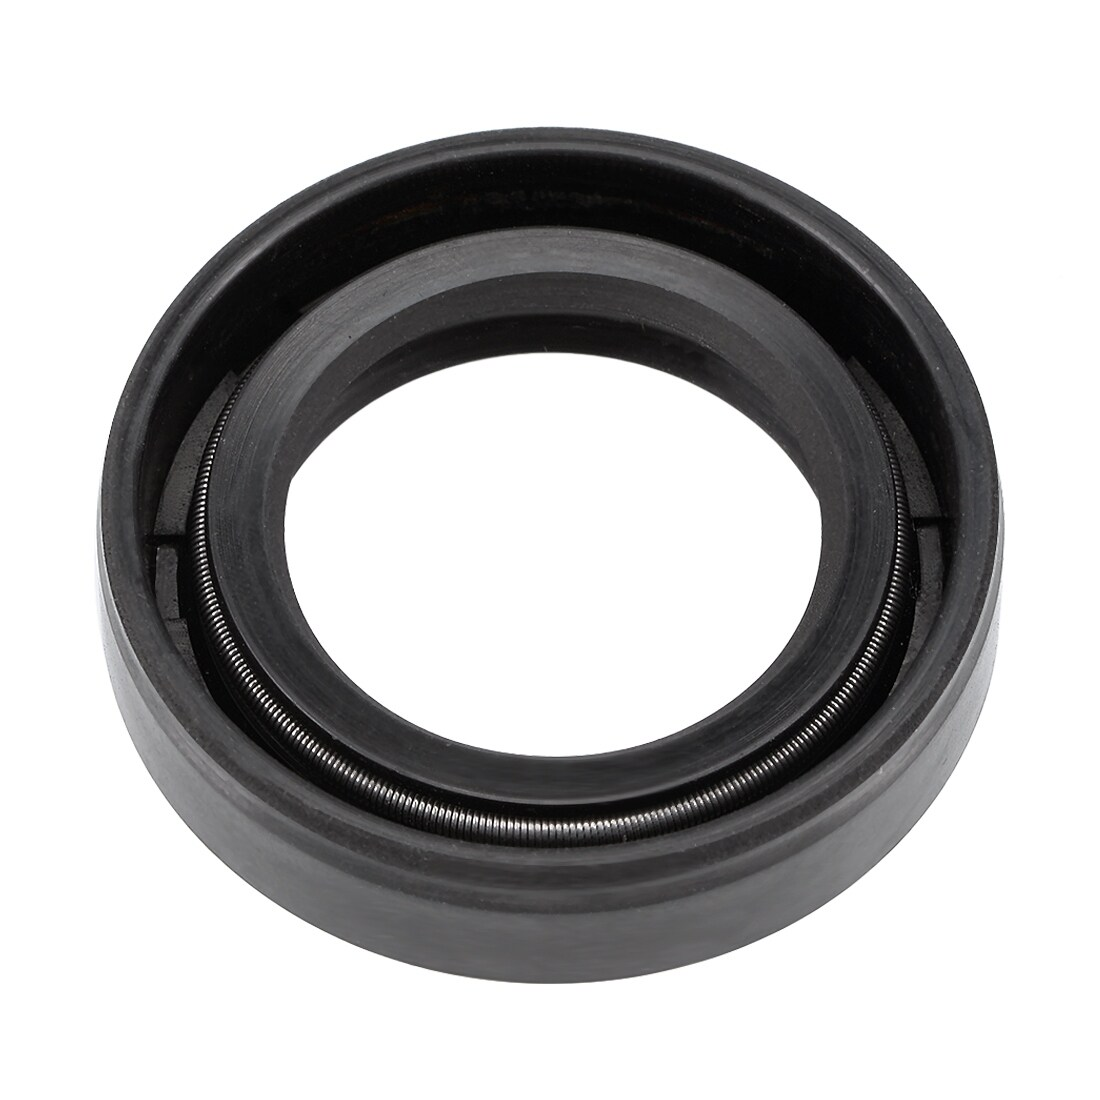 30x62x8 Nitrile Oil Seal